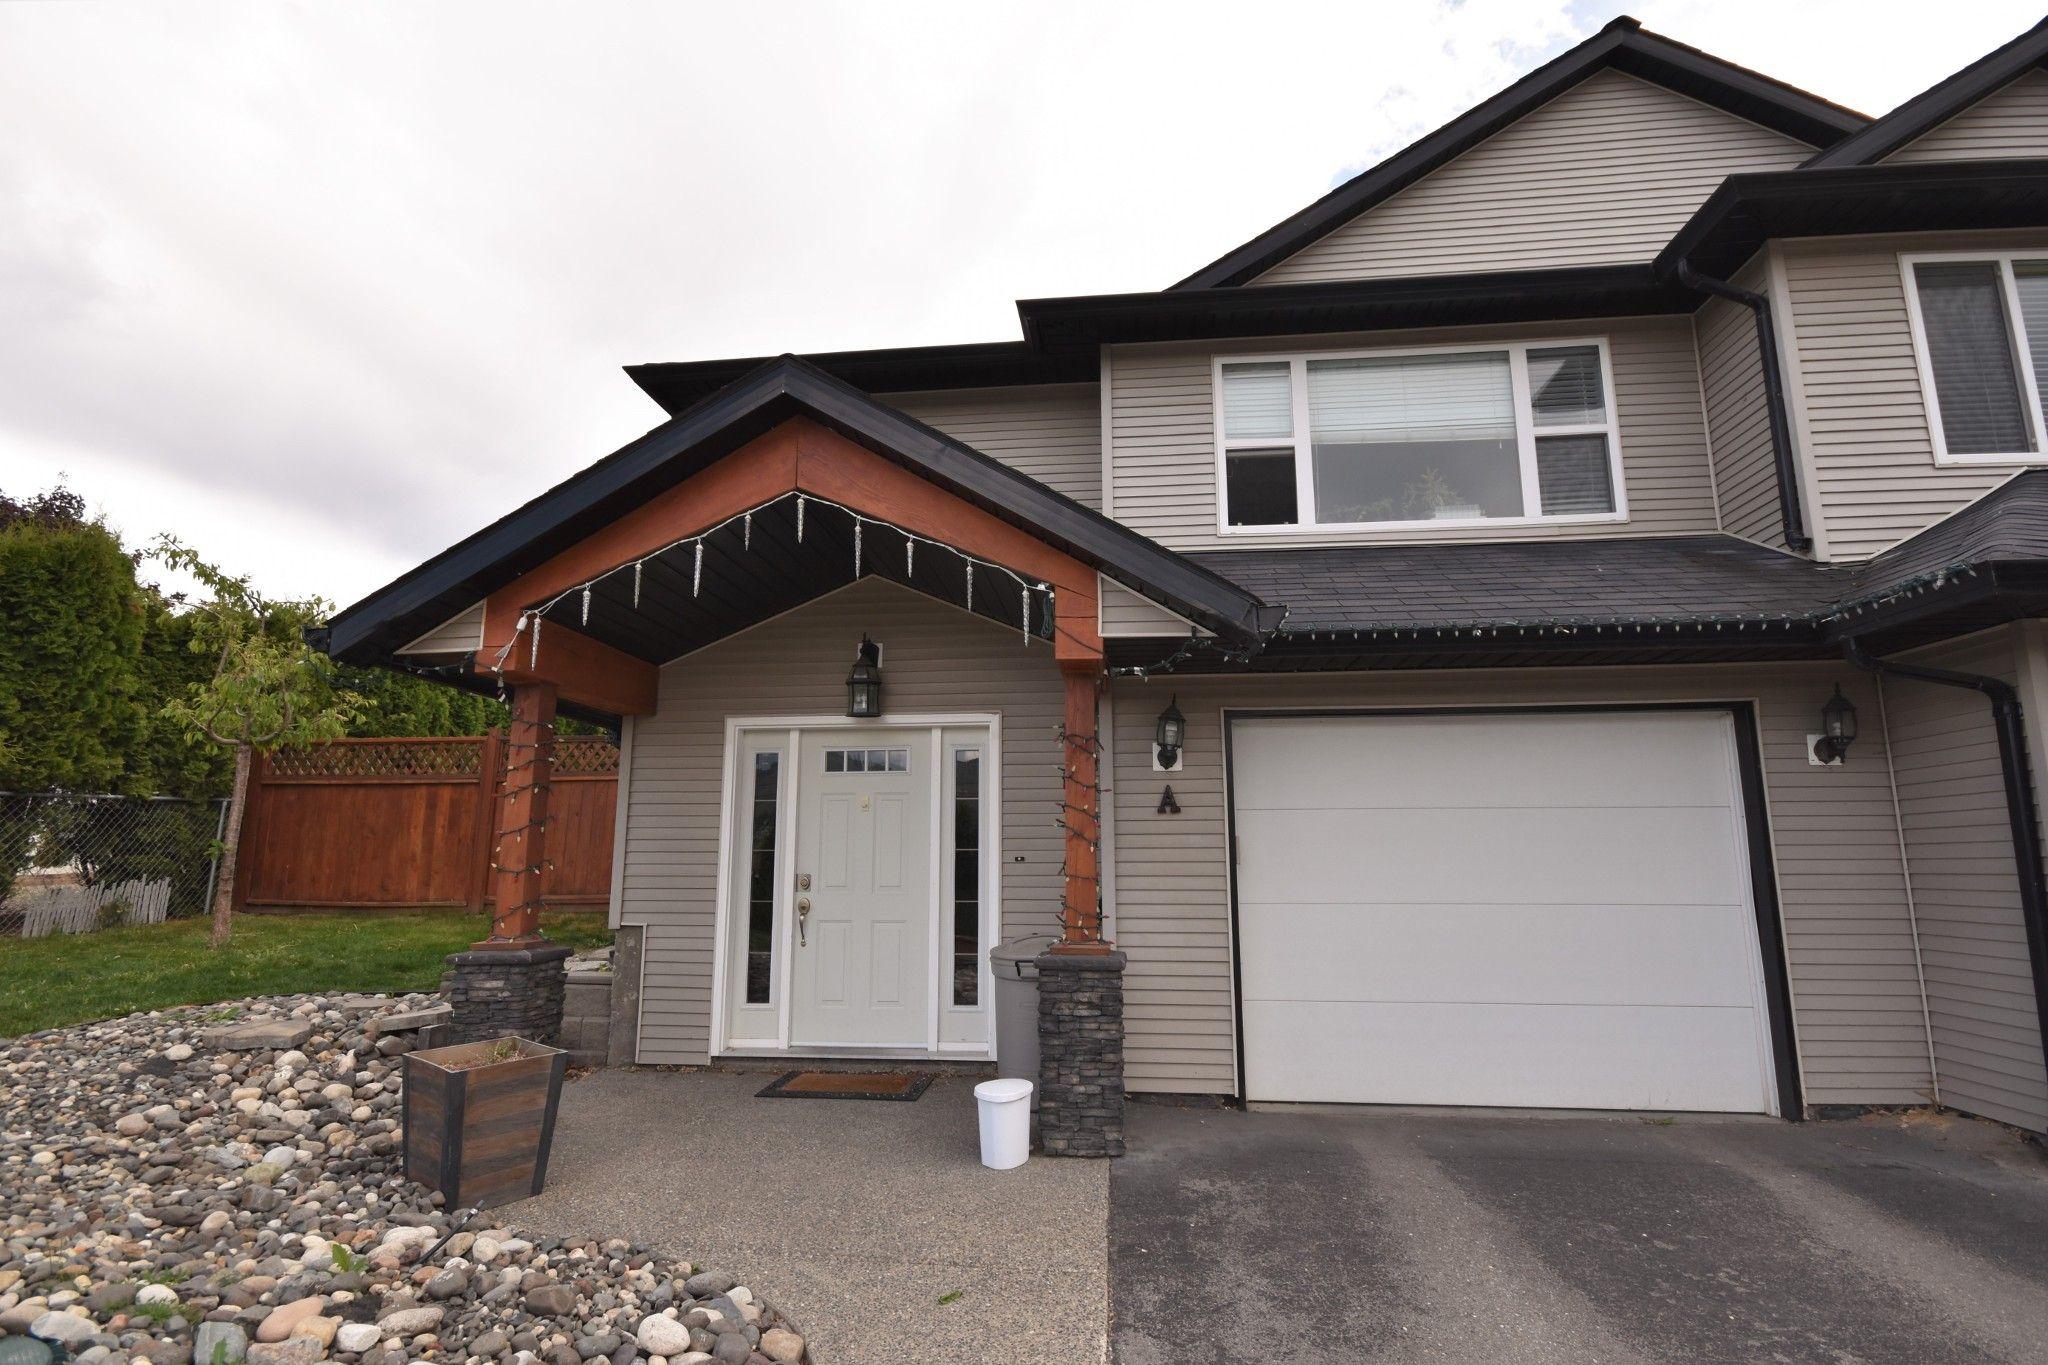 Main Photo: 6744A Longacre Drive in Vernon: Okanagan Landing House for sale (North Okanagan)  : MLS®# 10232359